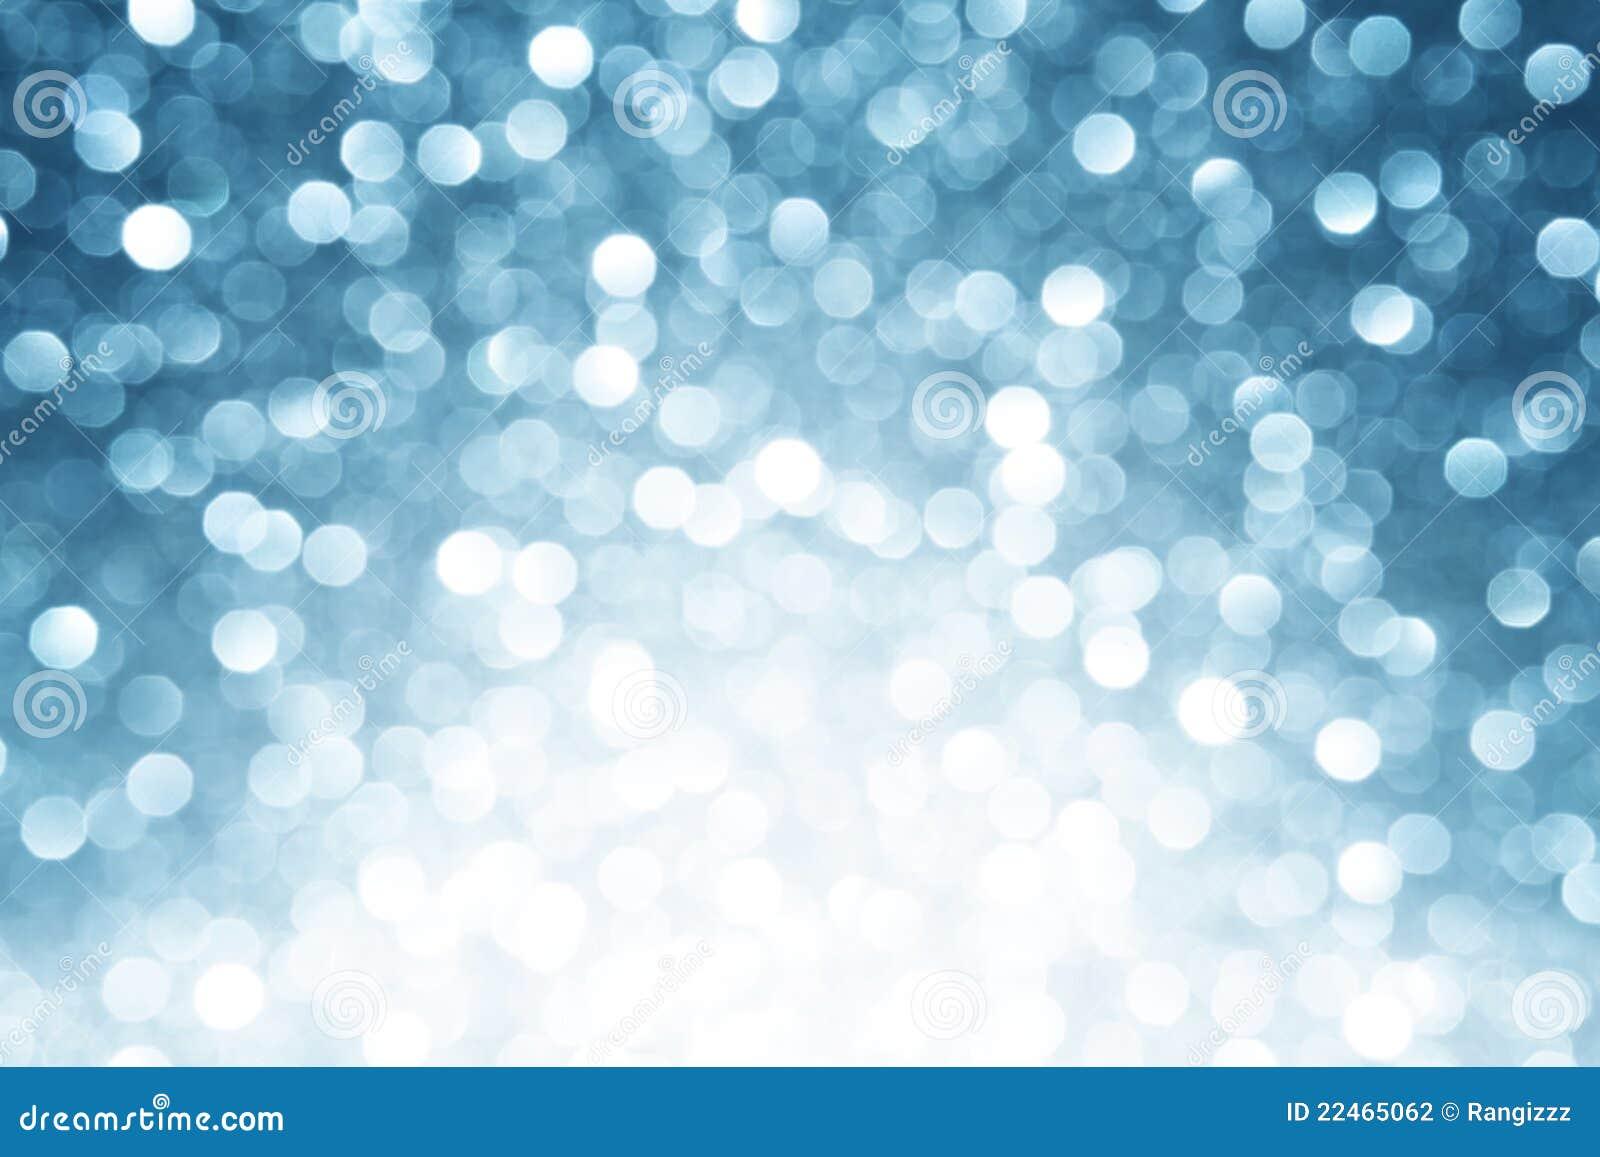 Fondo defocused azul de las luces